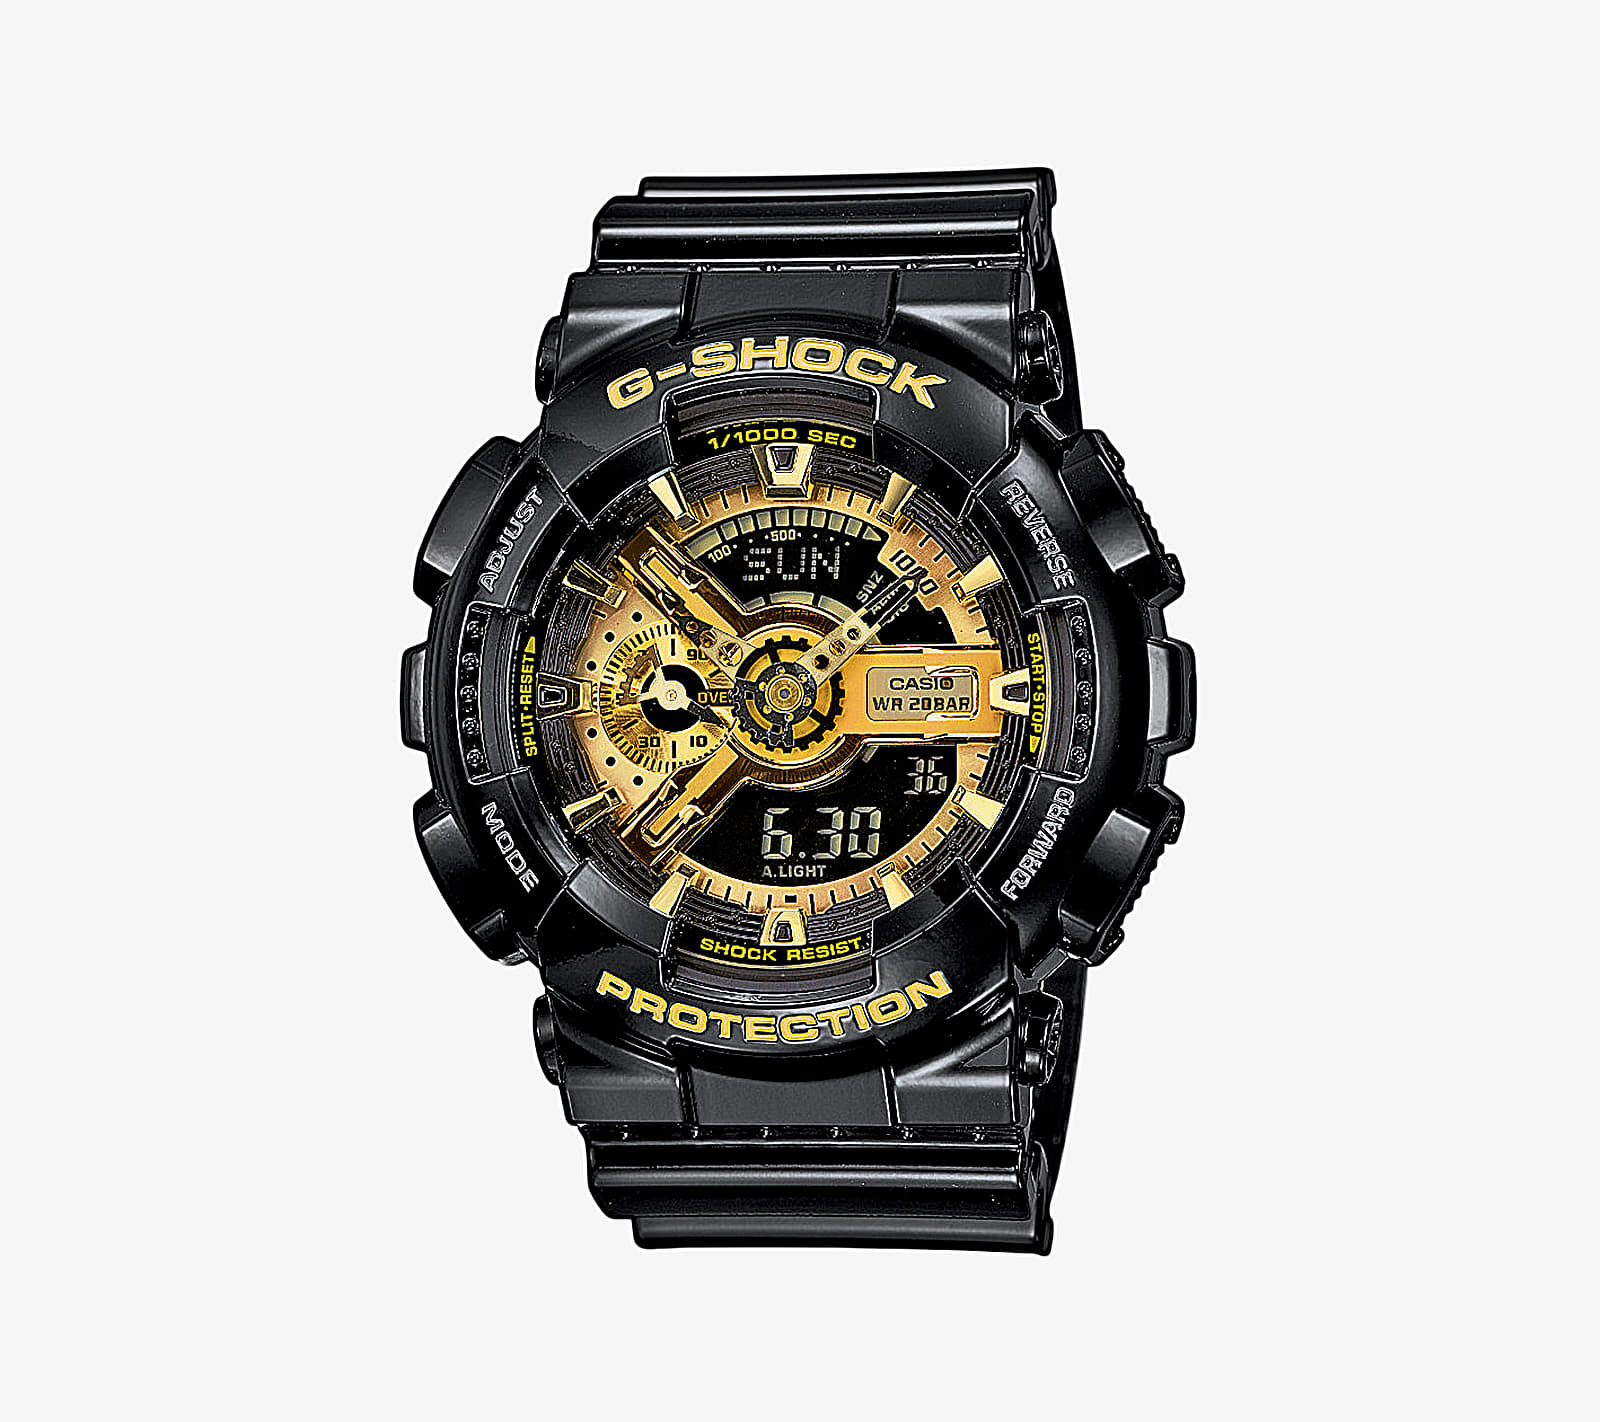 Casio G-Shock GA-110GB-1AER Watch Black univerzálna